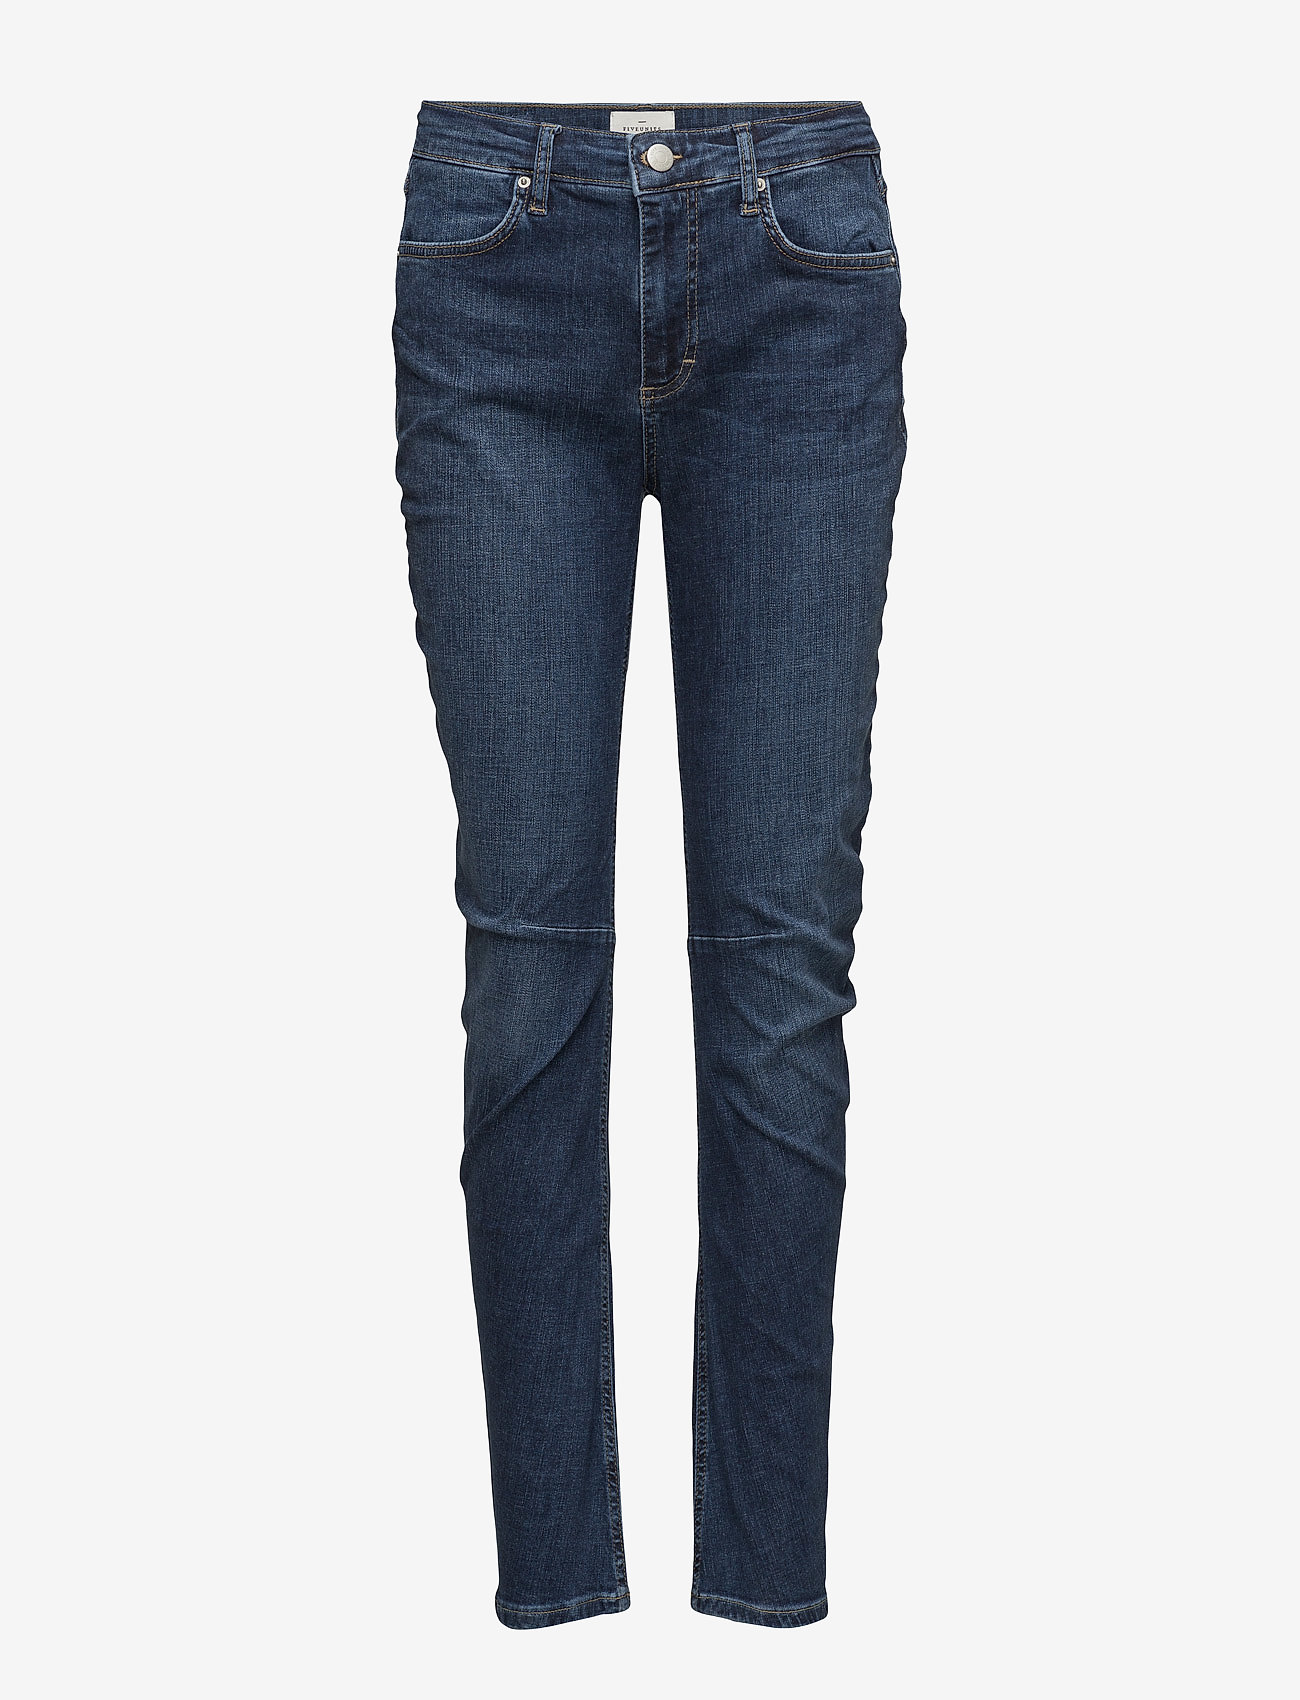 FIVEUNITS - Felicity 291 - slim jeans - faithful - 0